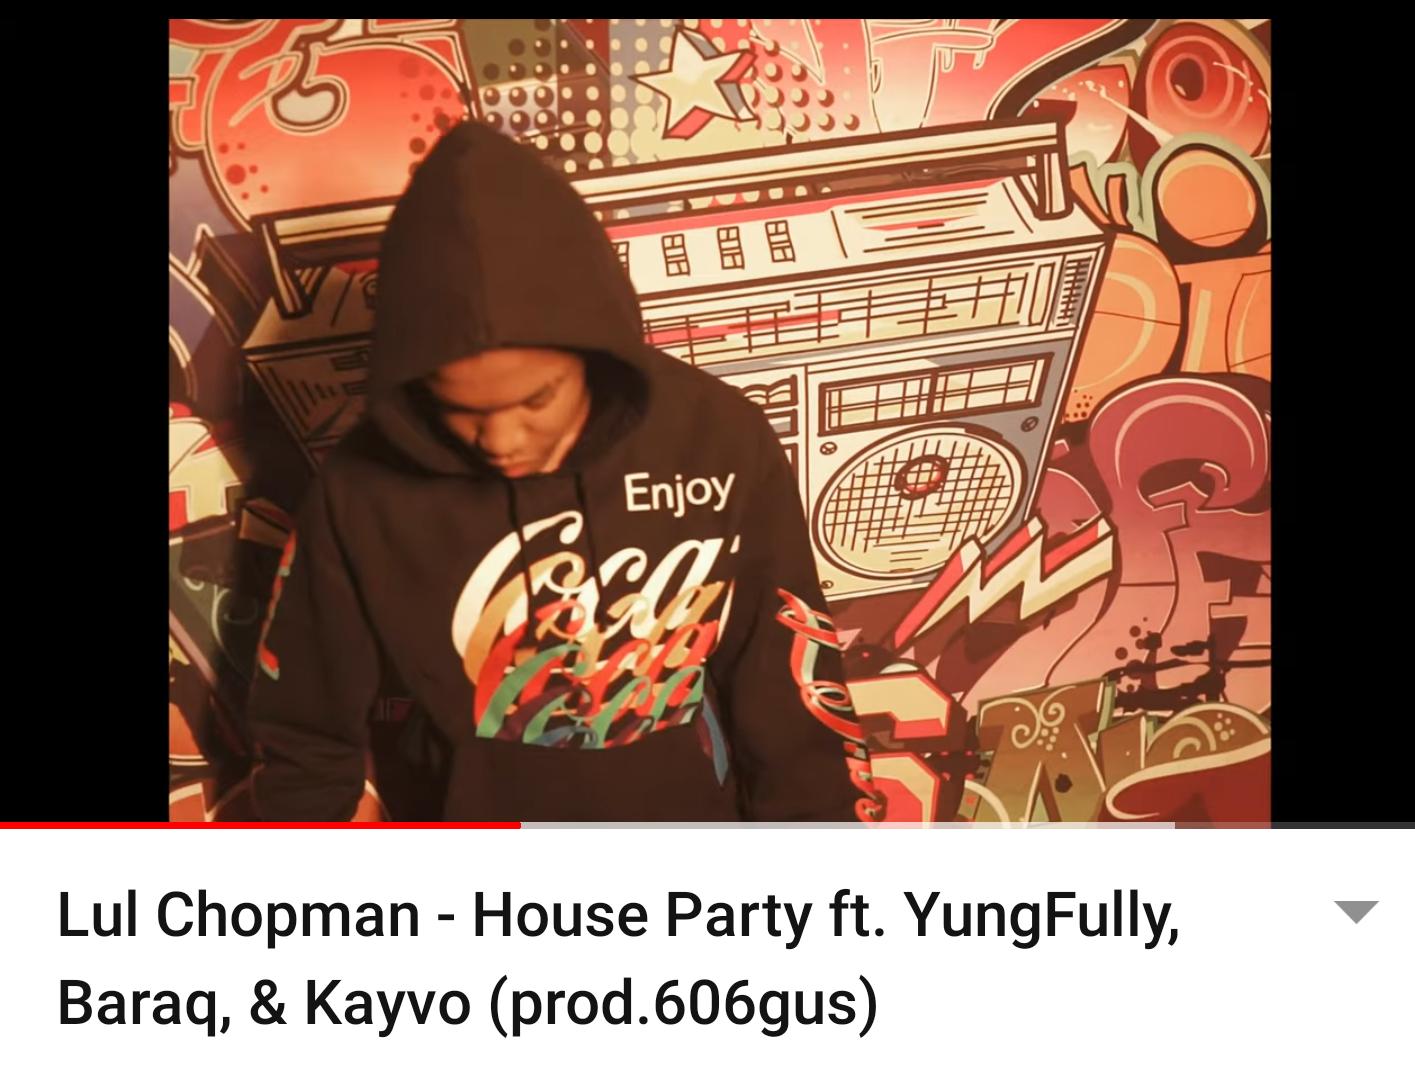 Lul Chopman – House Party ft. YungFully, Baraq, & Kayvo (prod.606gus)